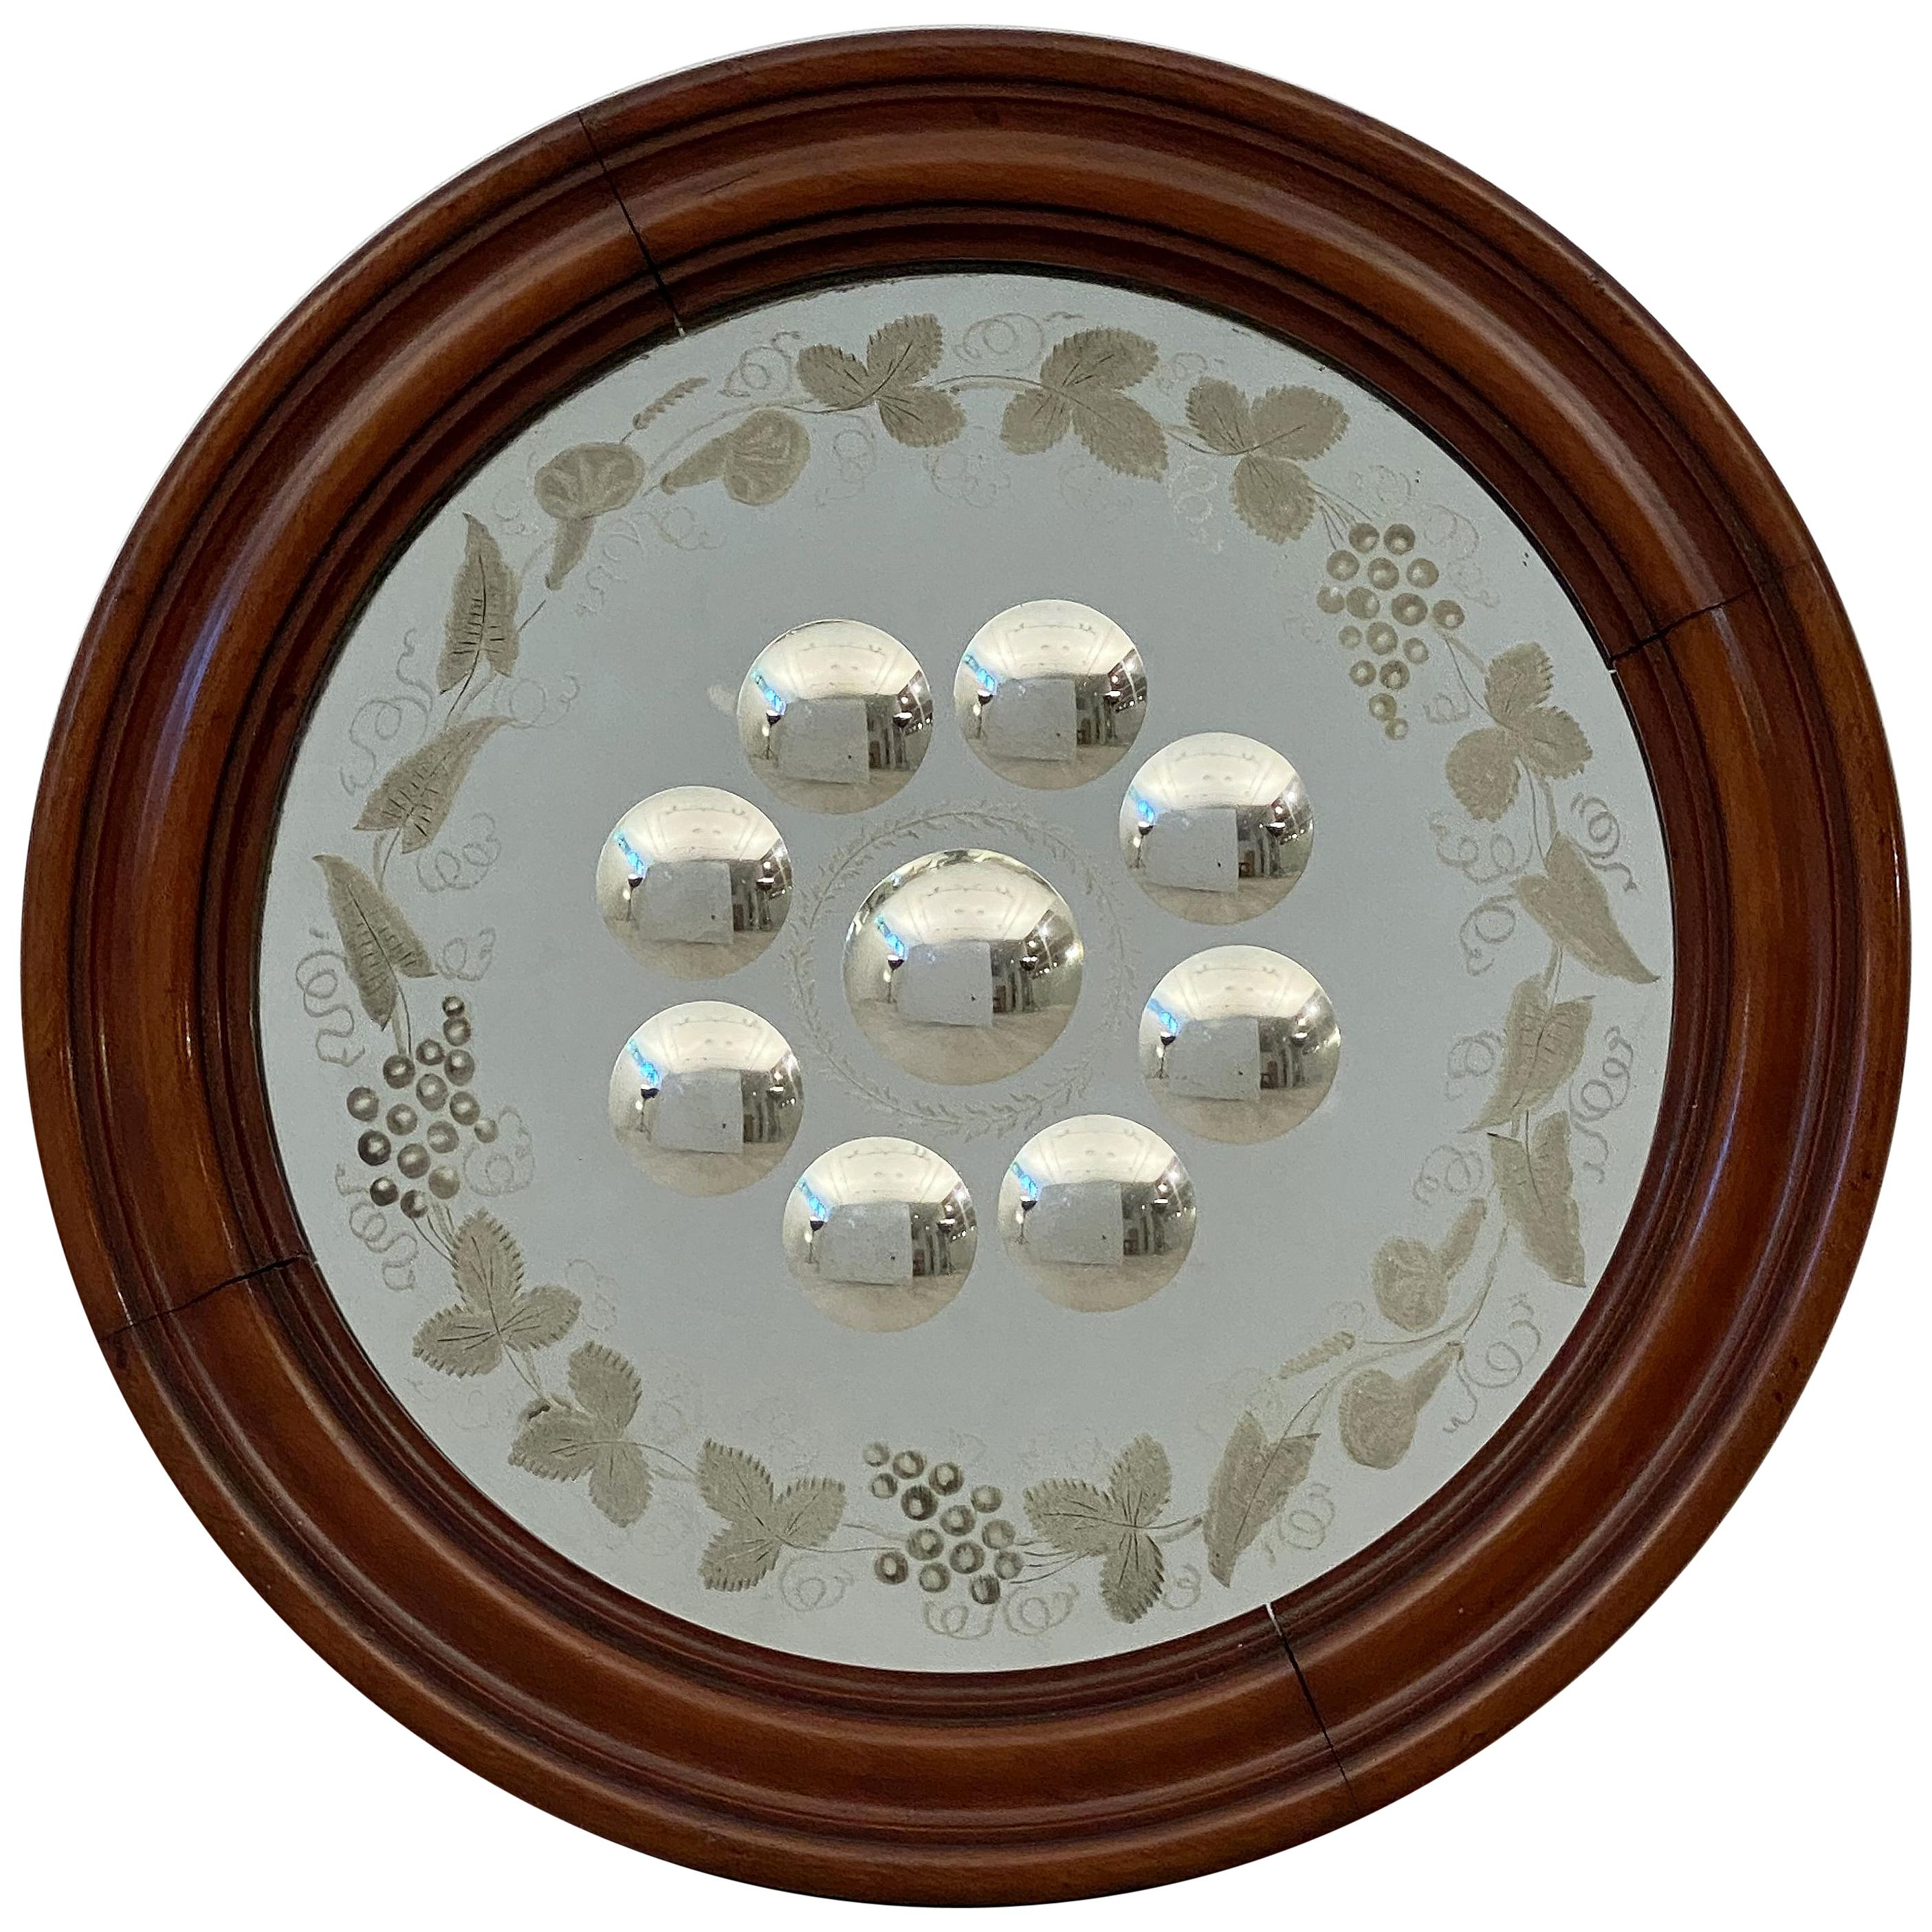 English Round Sorcerer's or Bullseye Convex Mirror (Diameter 15)